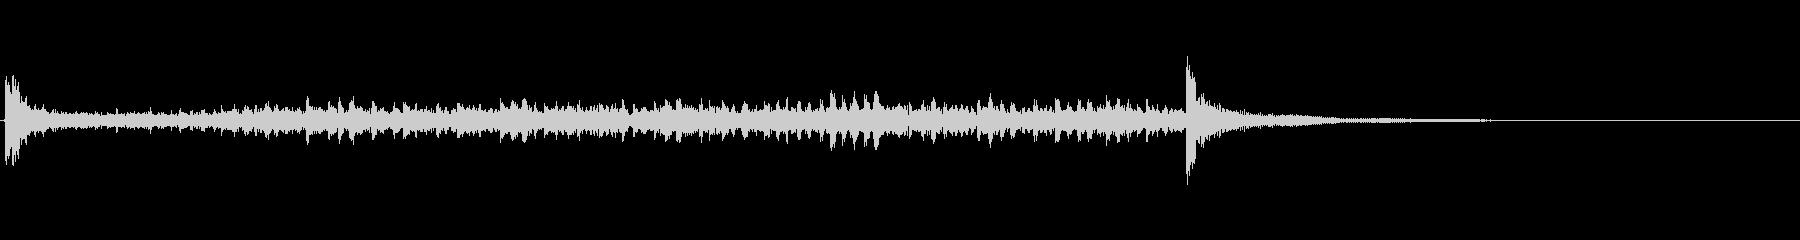 ROLL:IN D、MUSIC、P...の未再生の波形